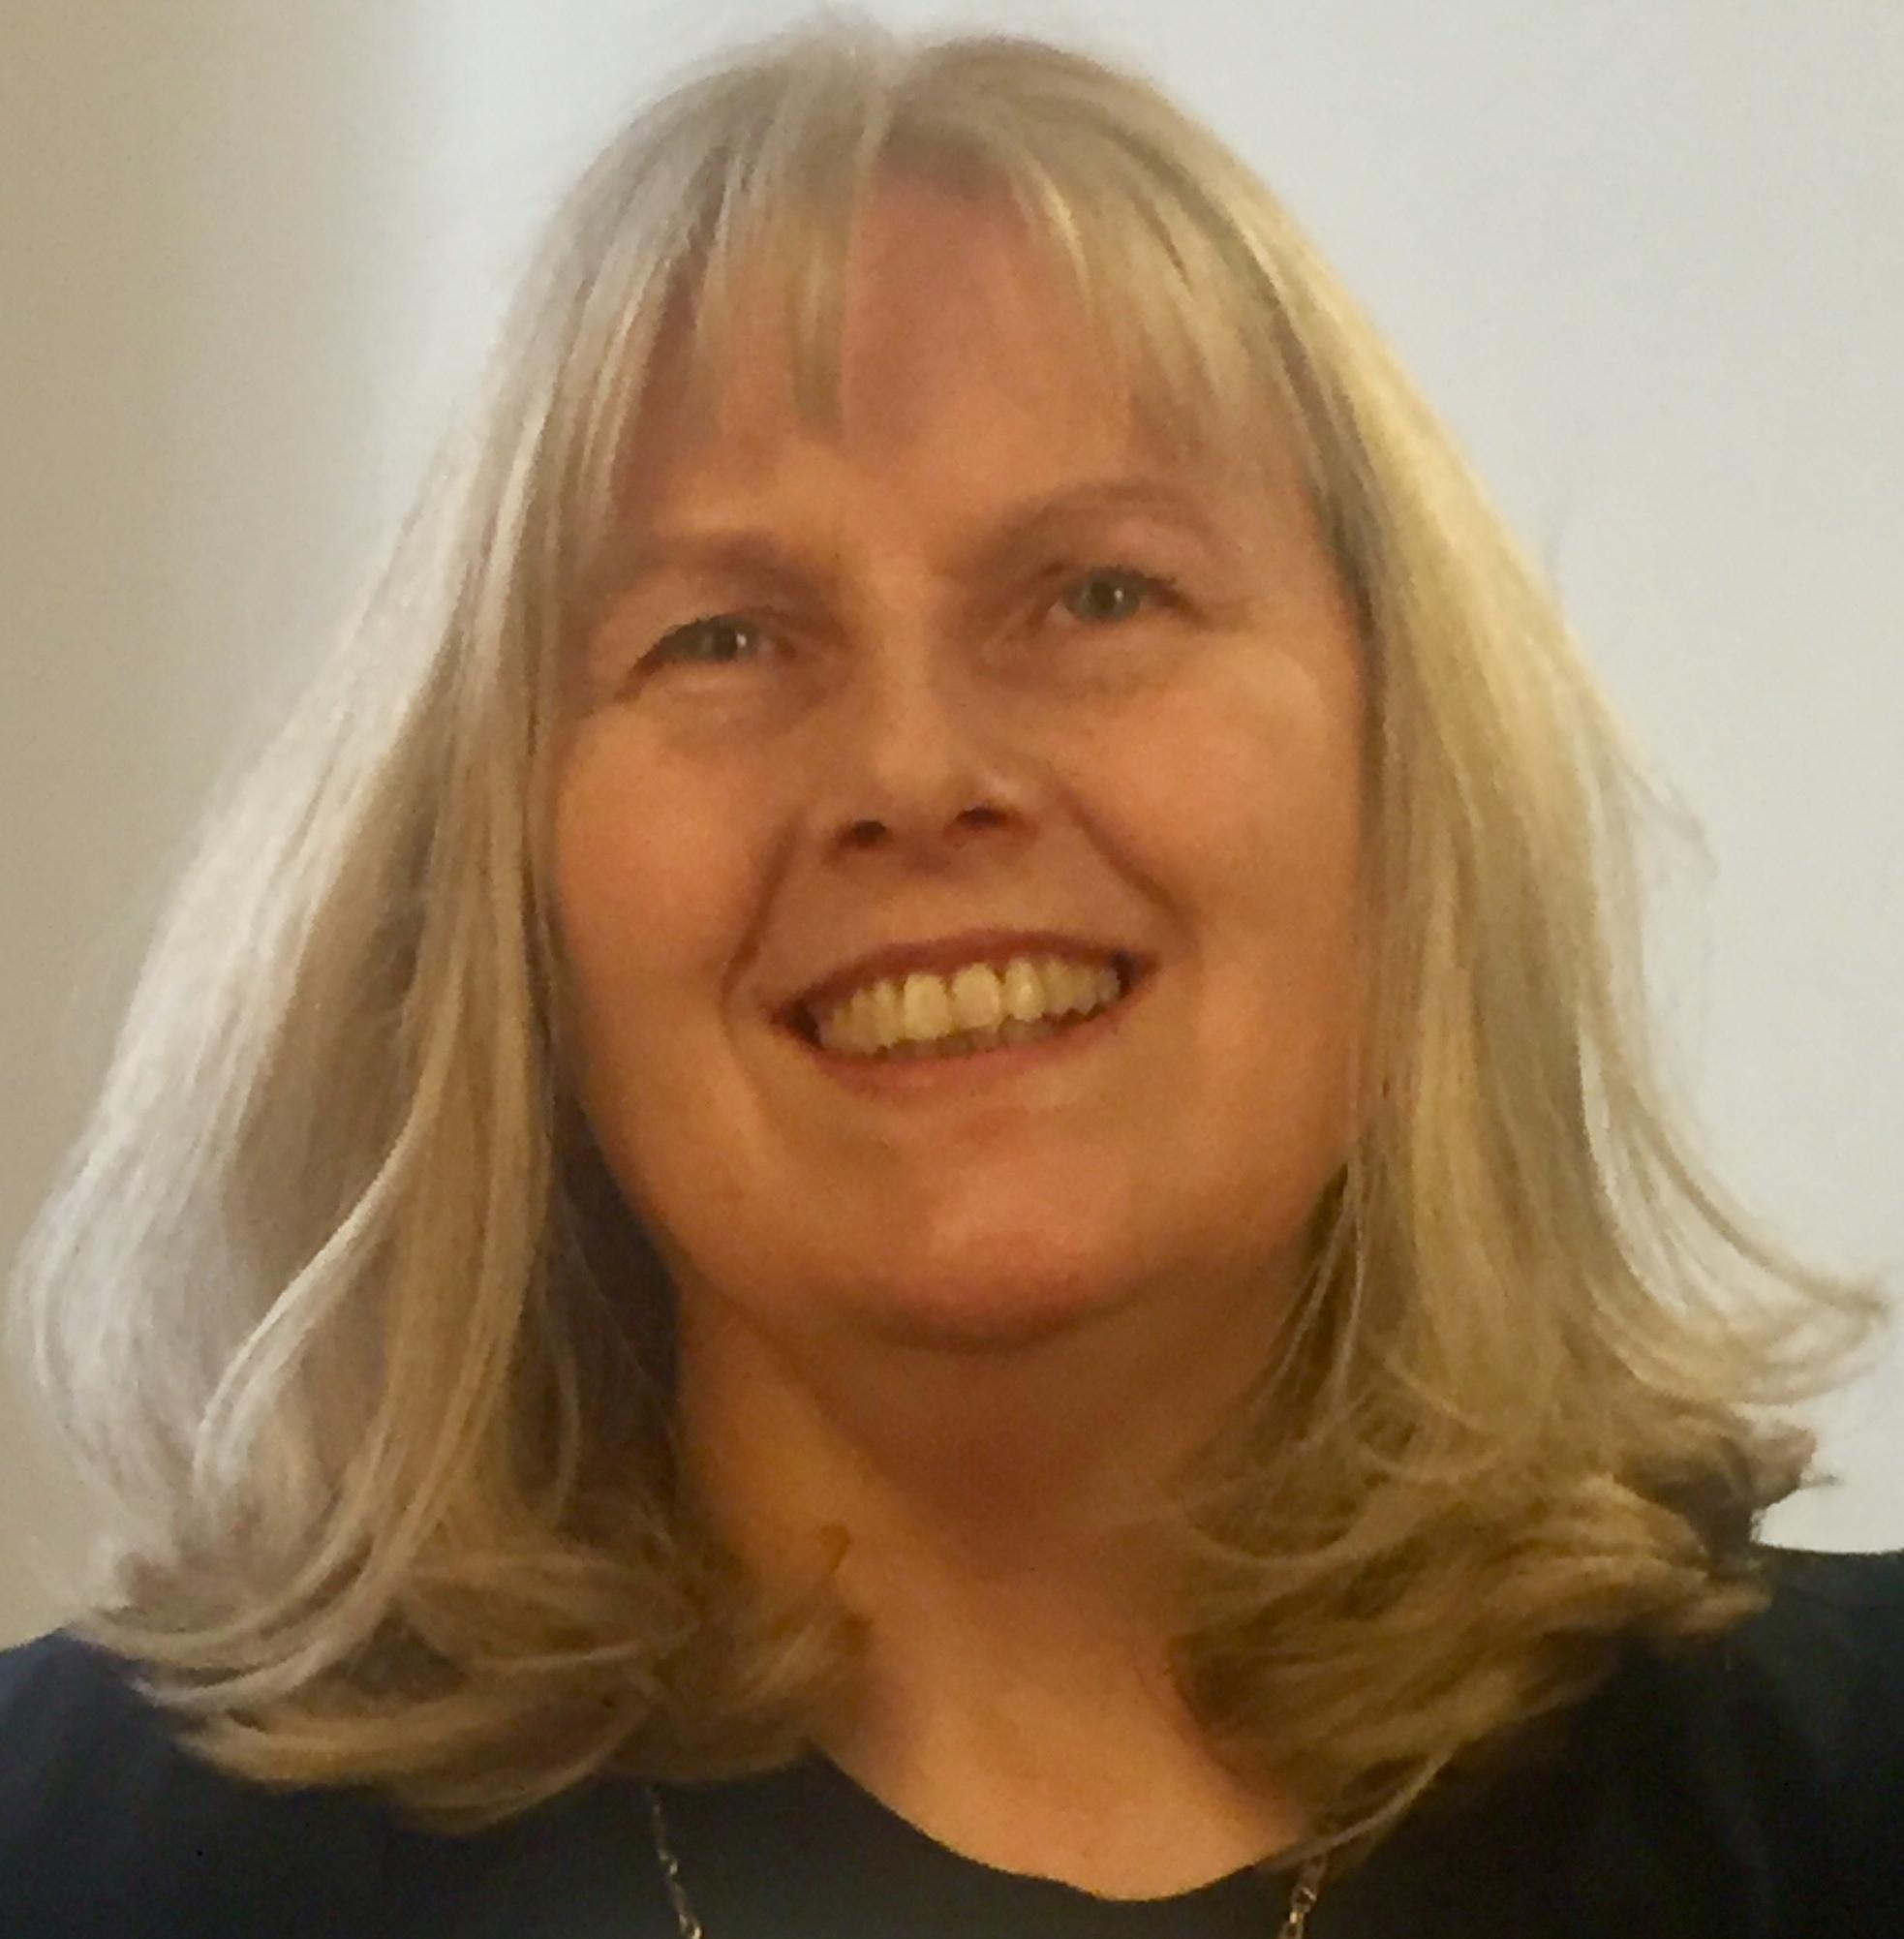 Fiona Campbell Trevor - Owner & Head Gardner. Retired corporate adviser. History bore. pet slave,